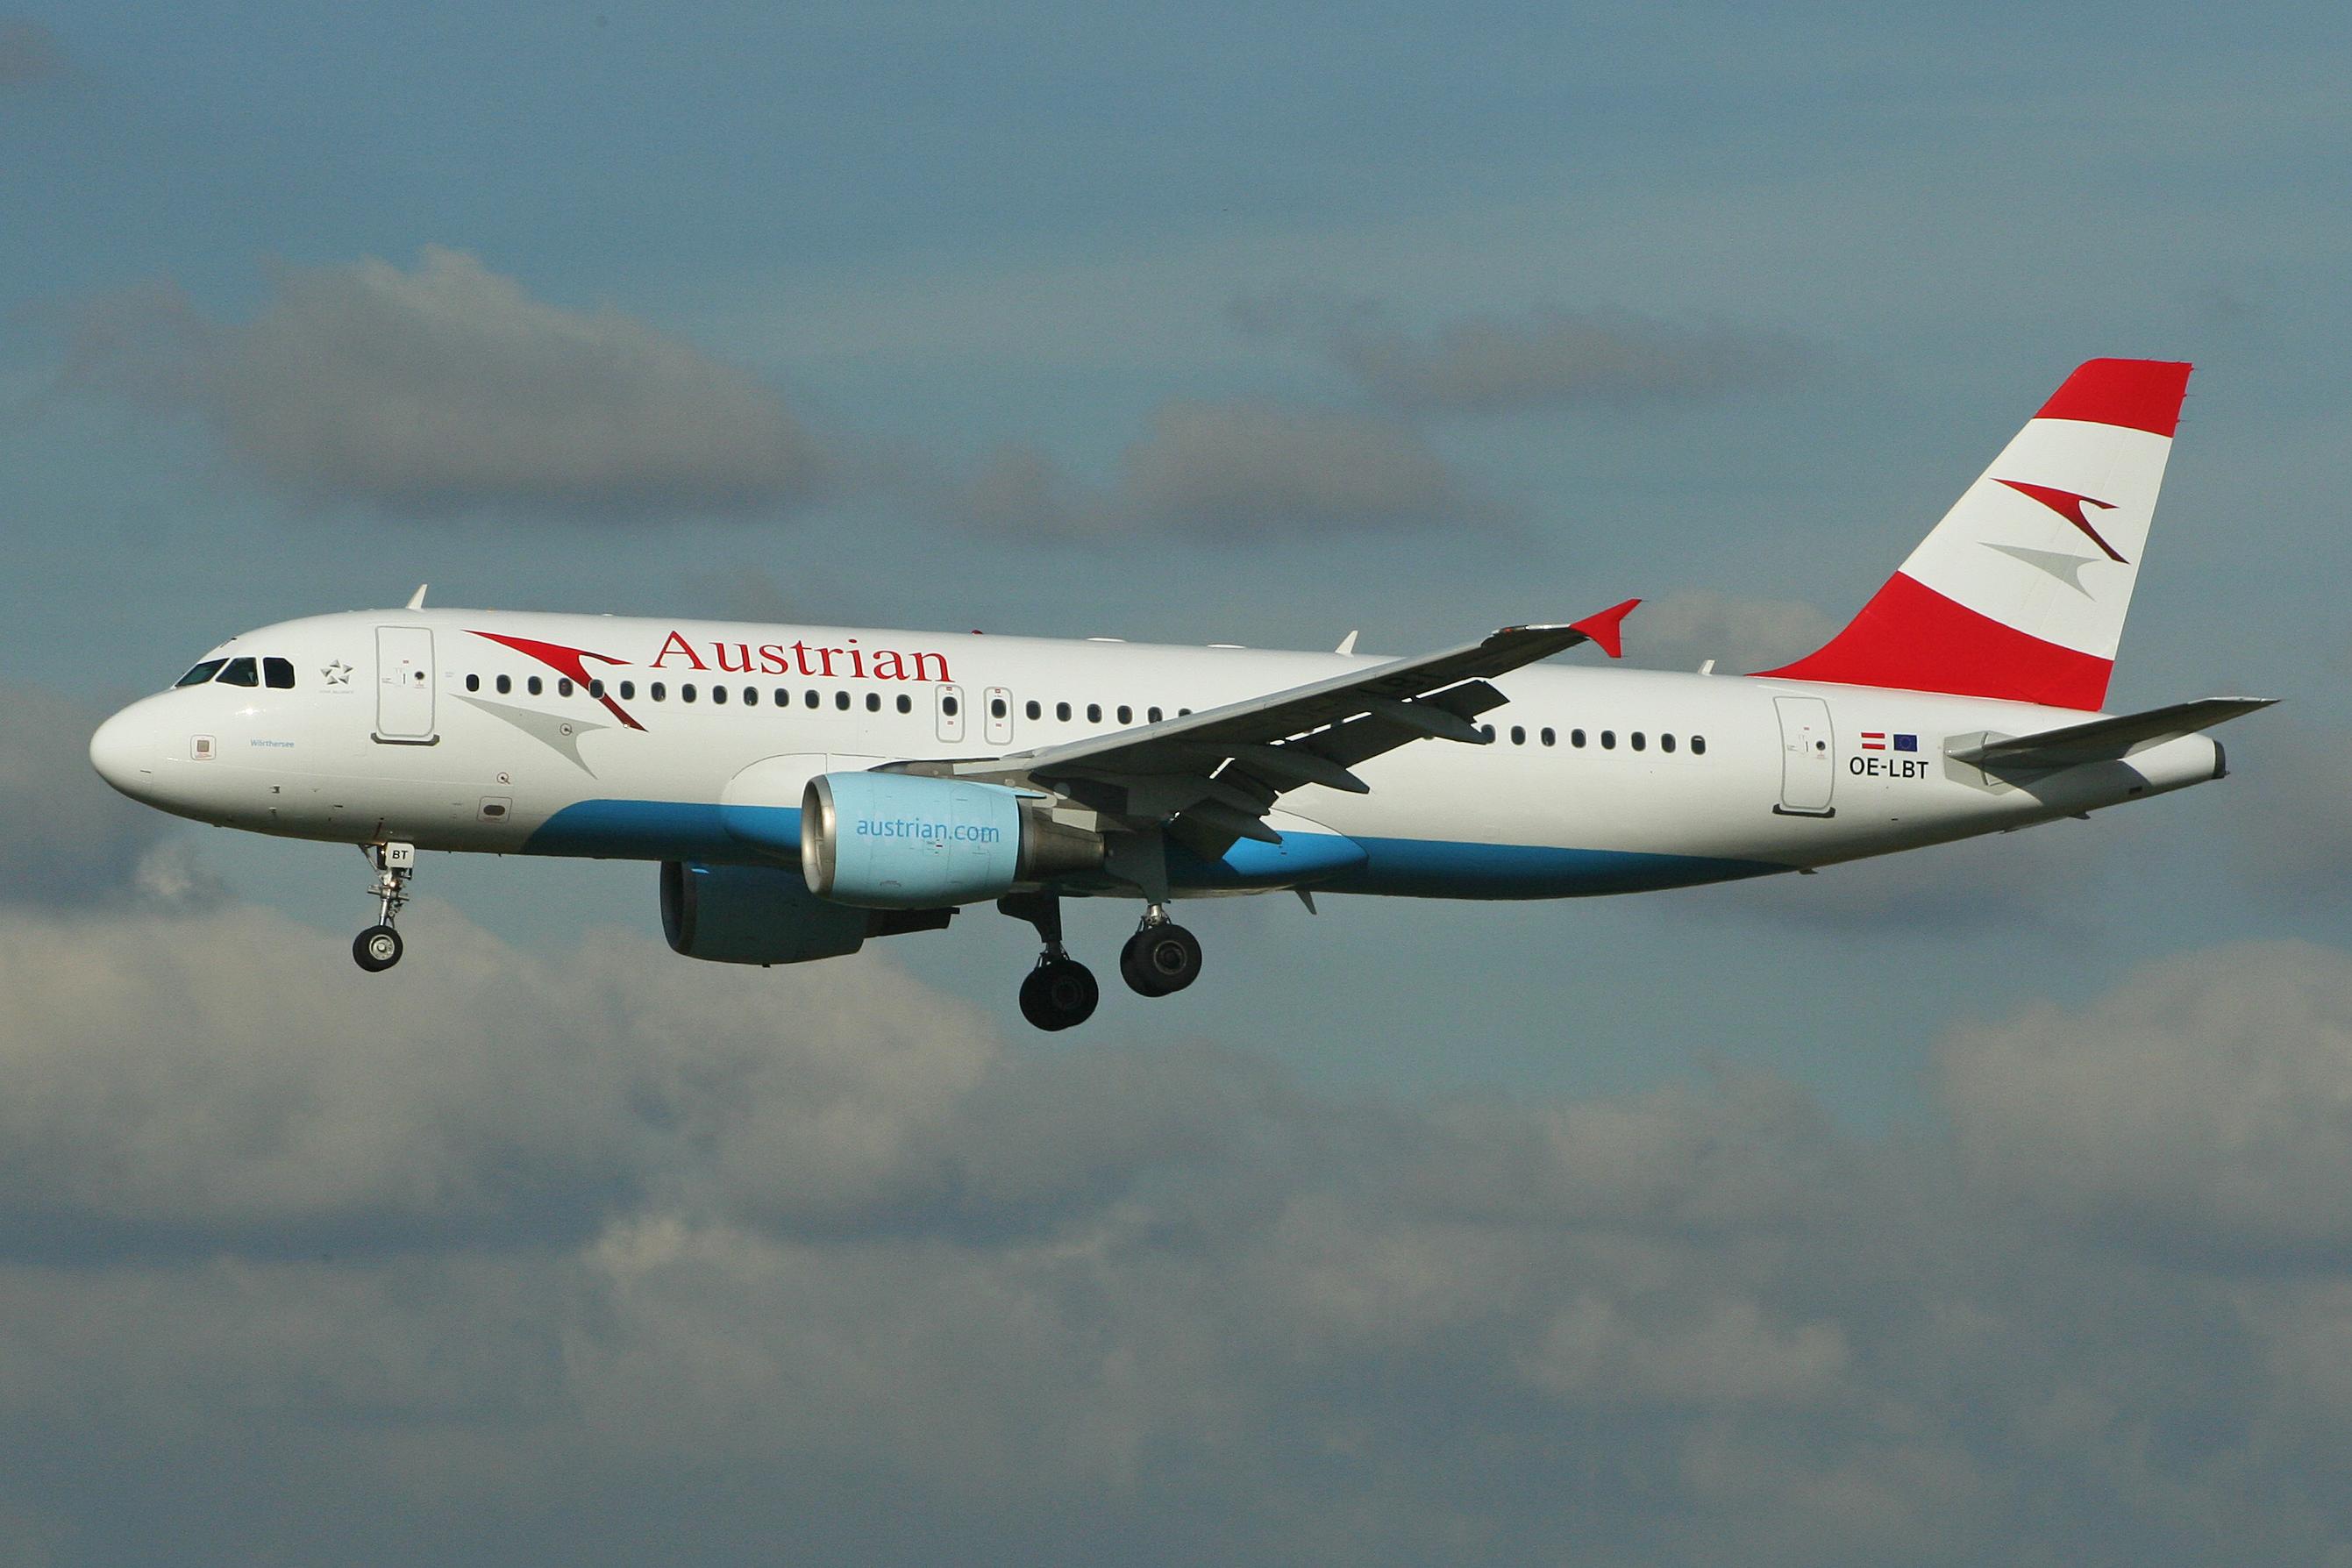 En Airbus A320-200 fra Austrian Airlines. Foto: Alan Wilson